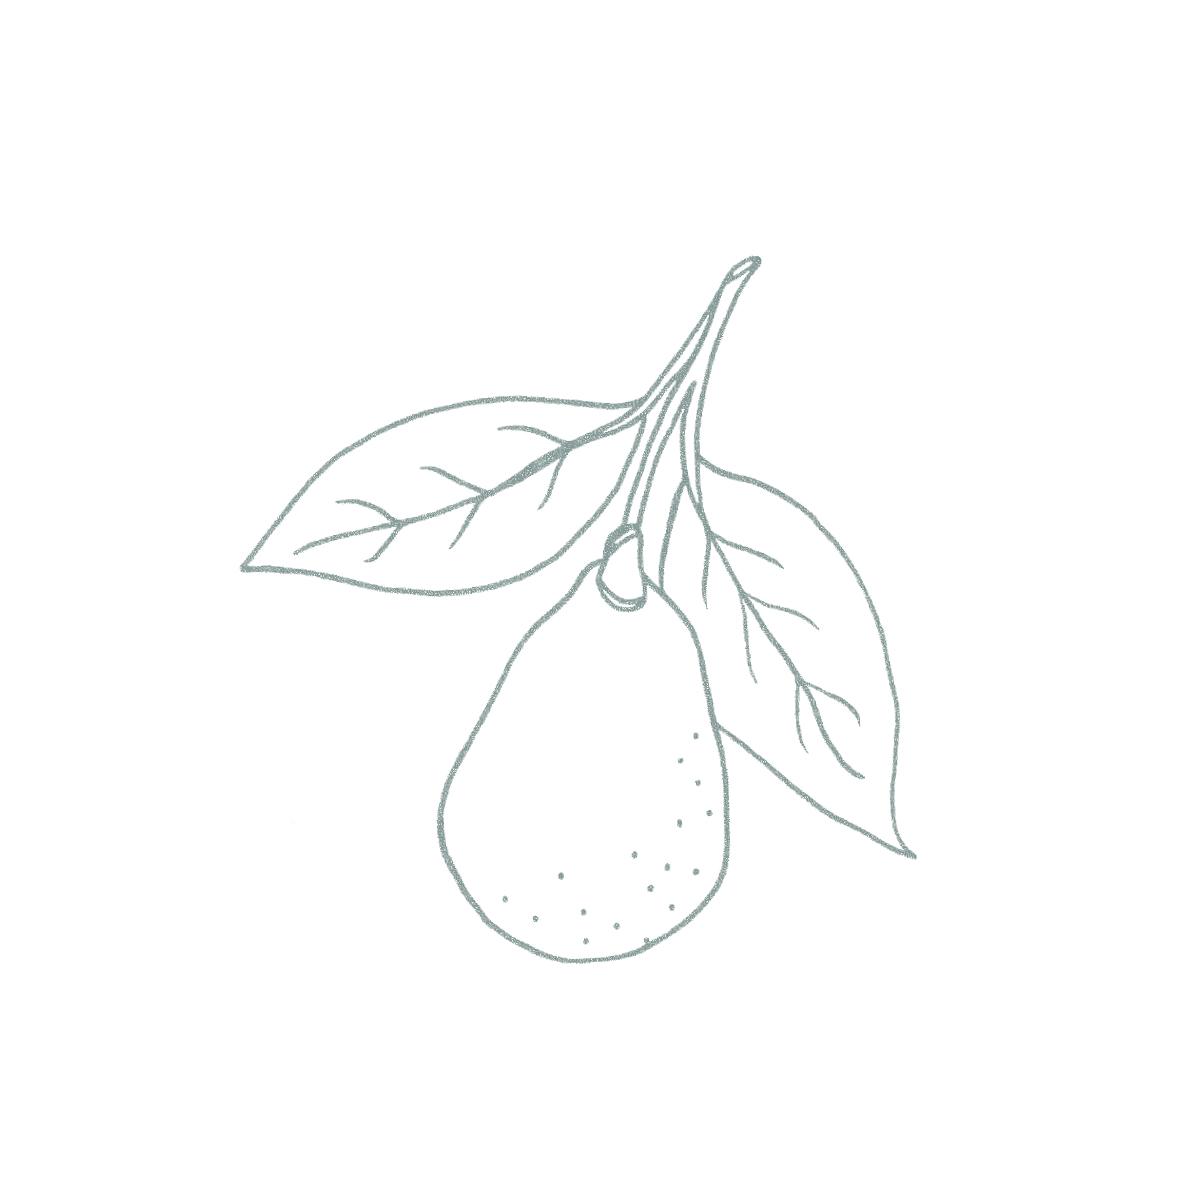 line drawing, illustration of avocado